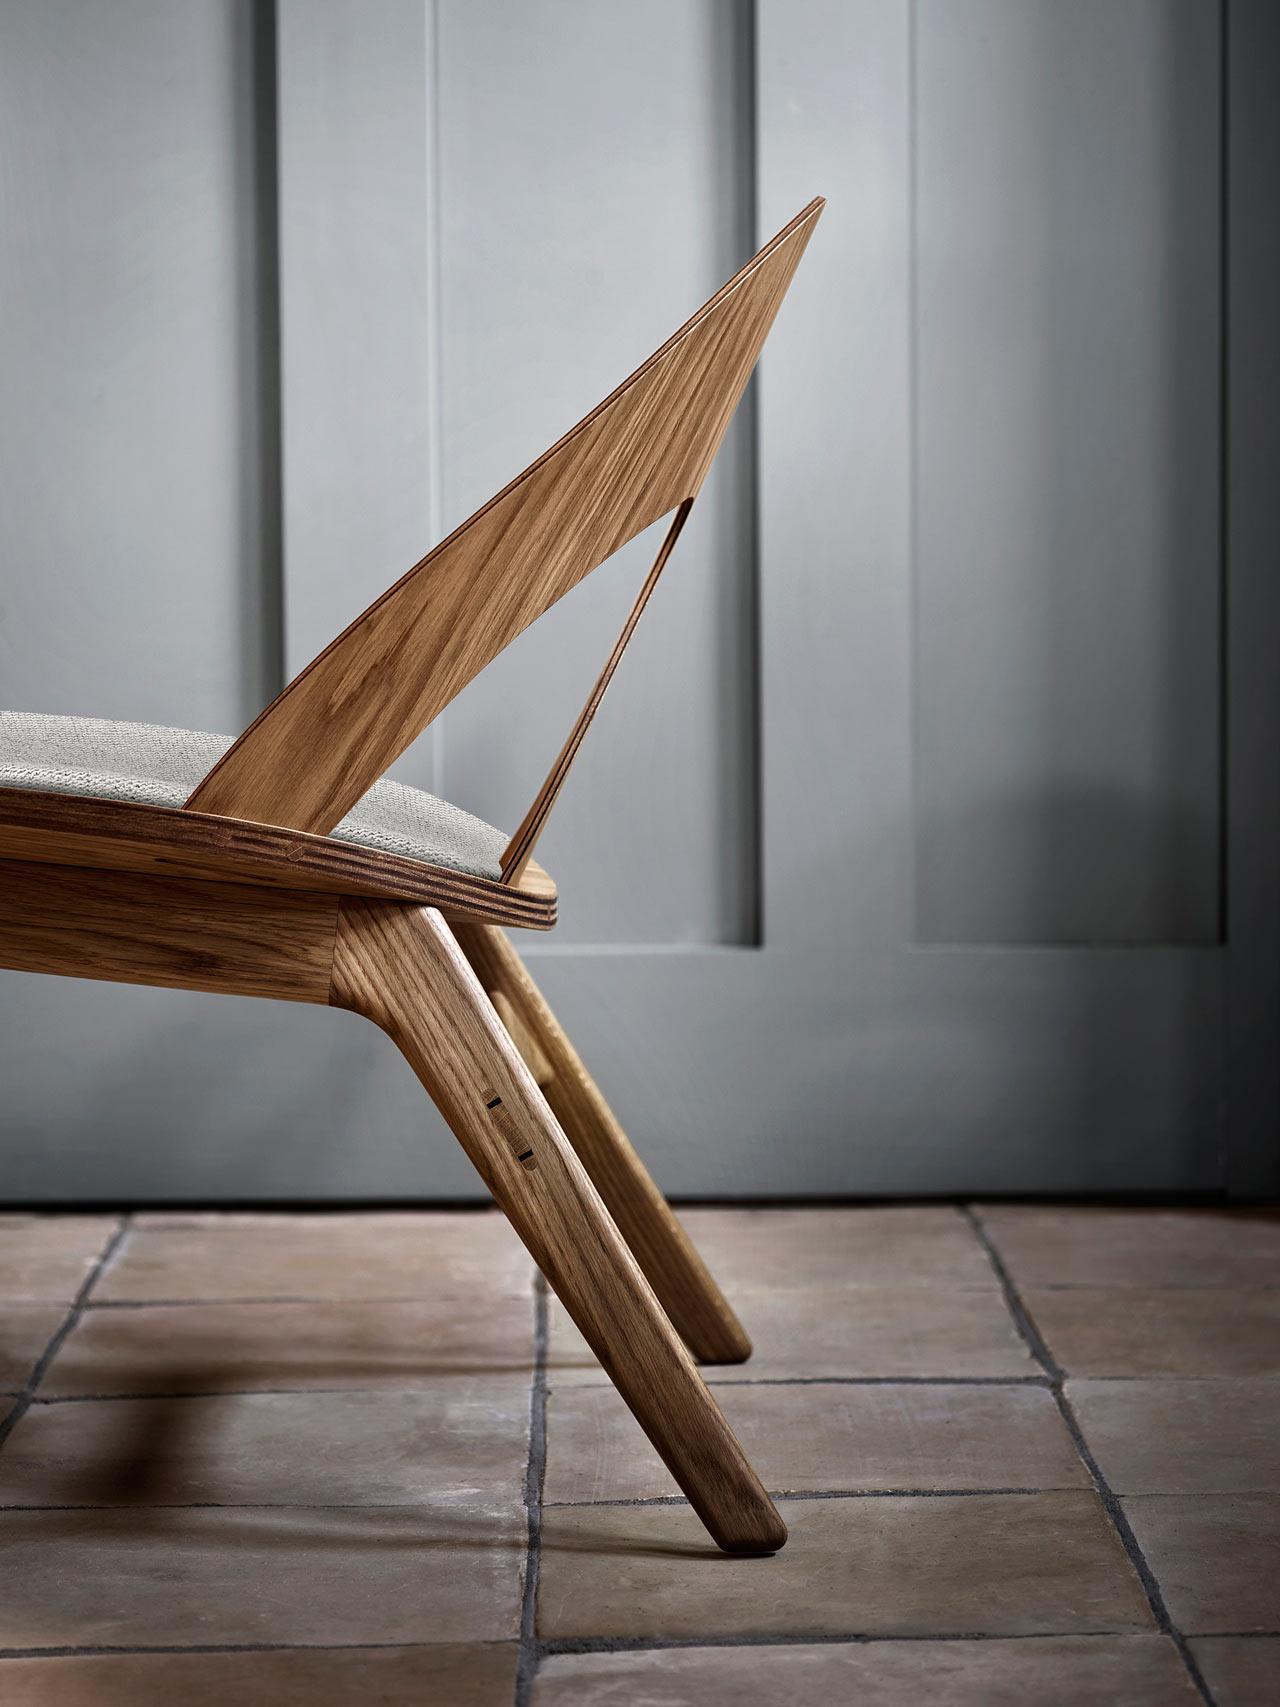 Contour-chair-Mogensen-Carl-Hansen-11.jpg